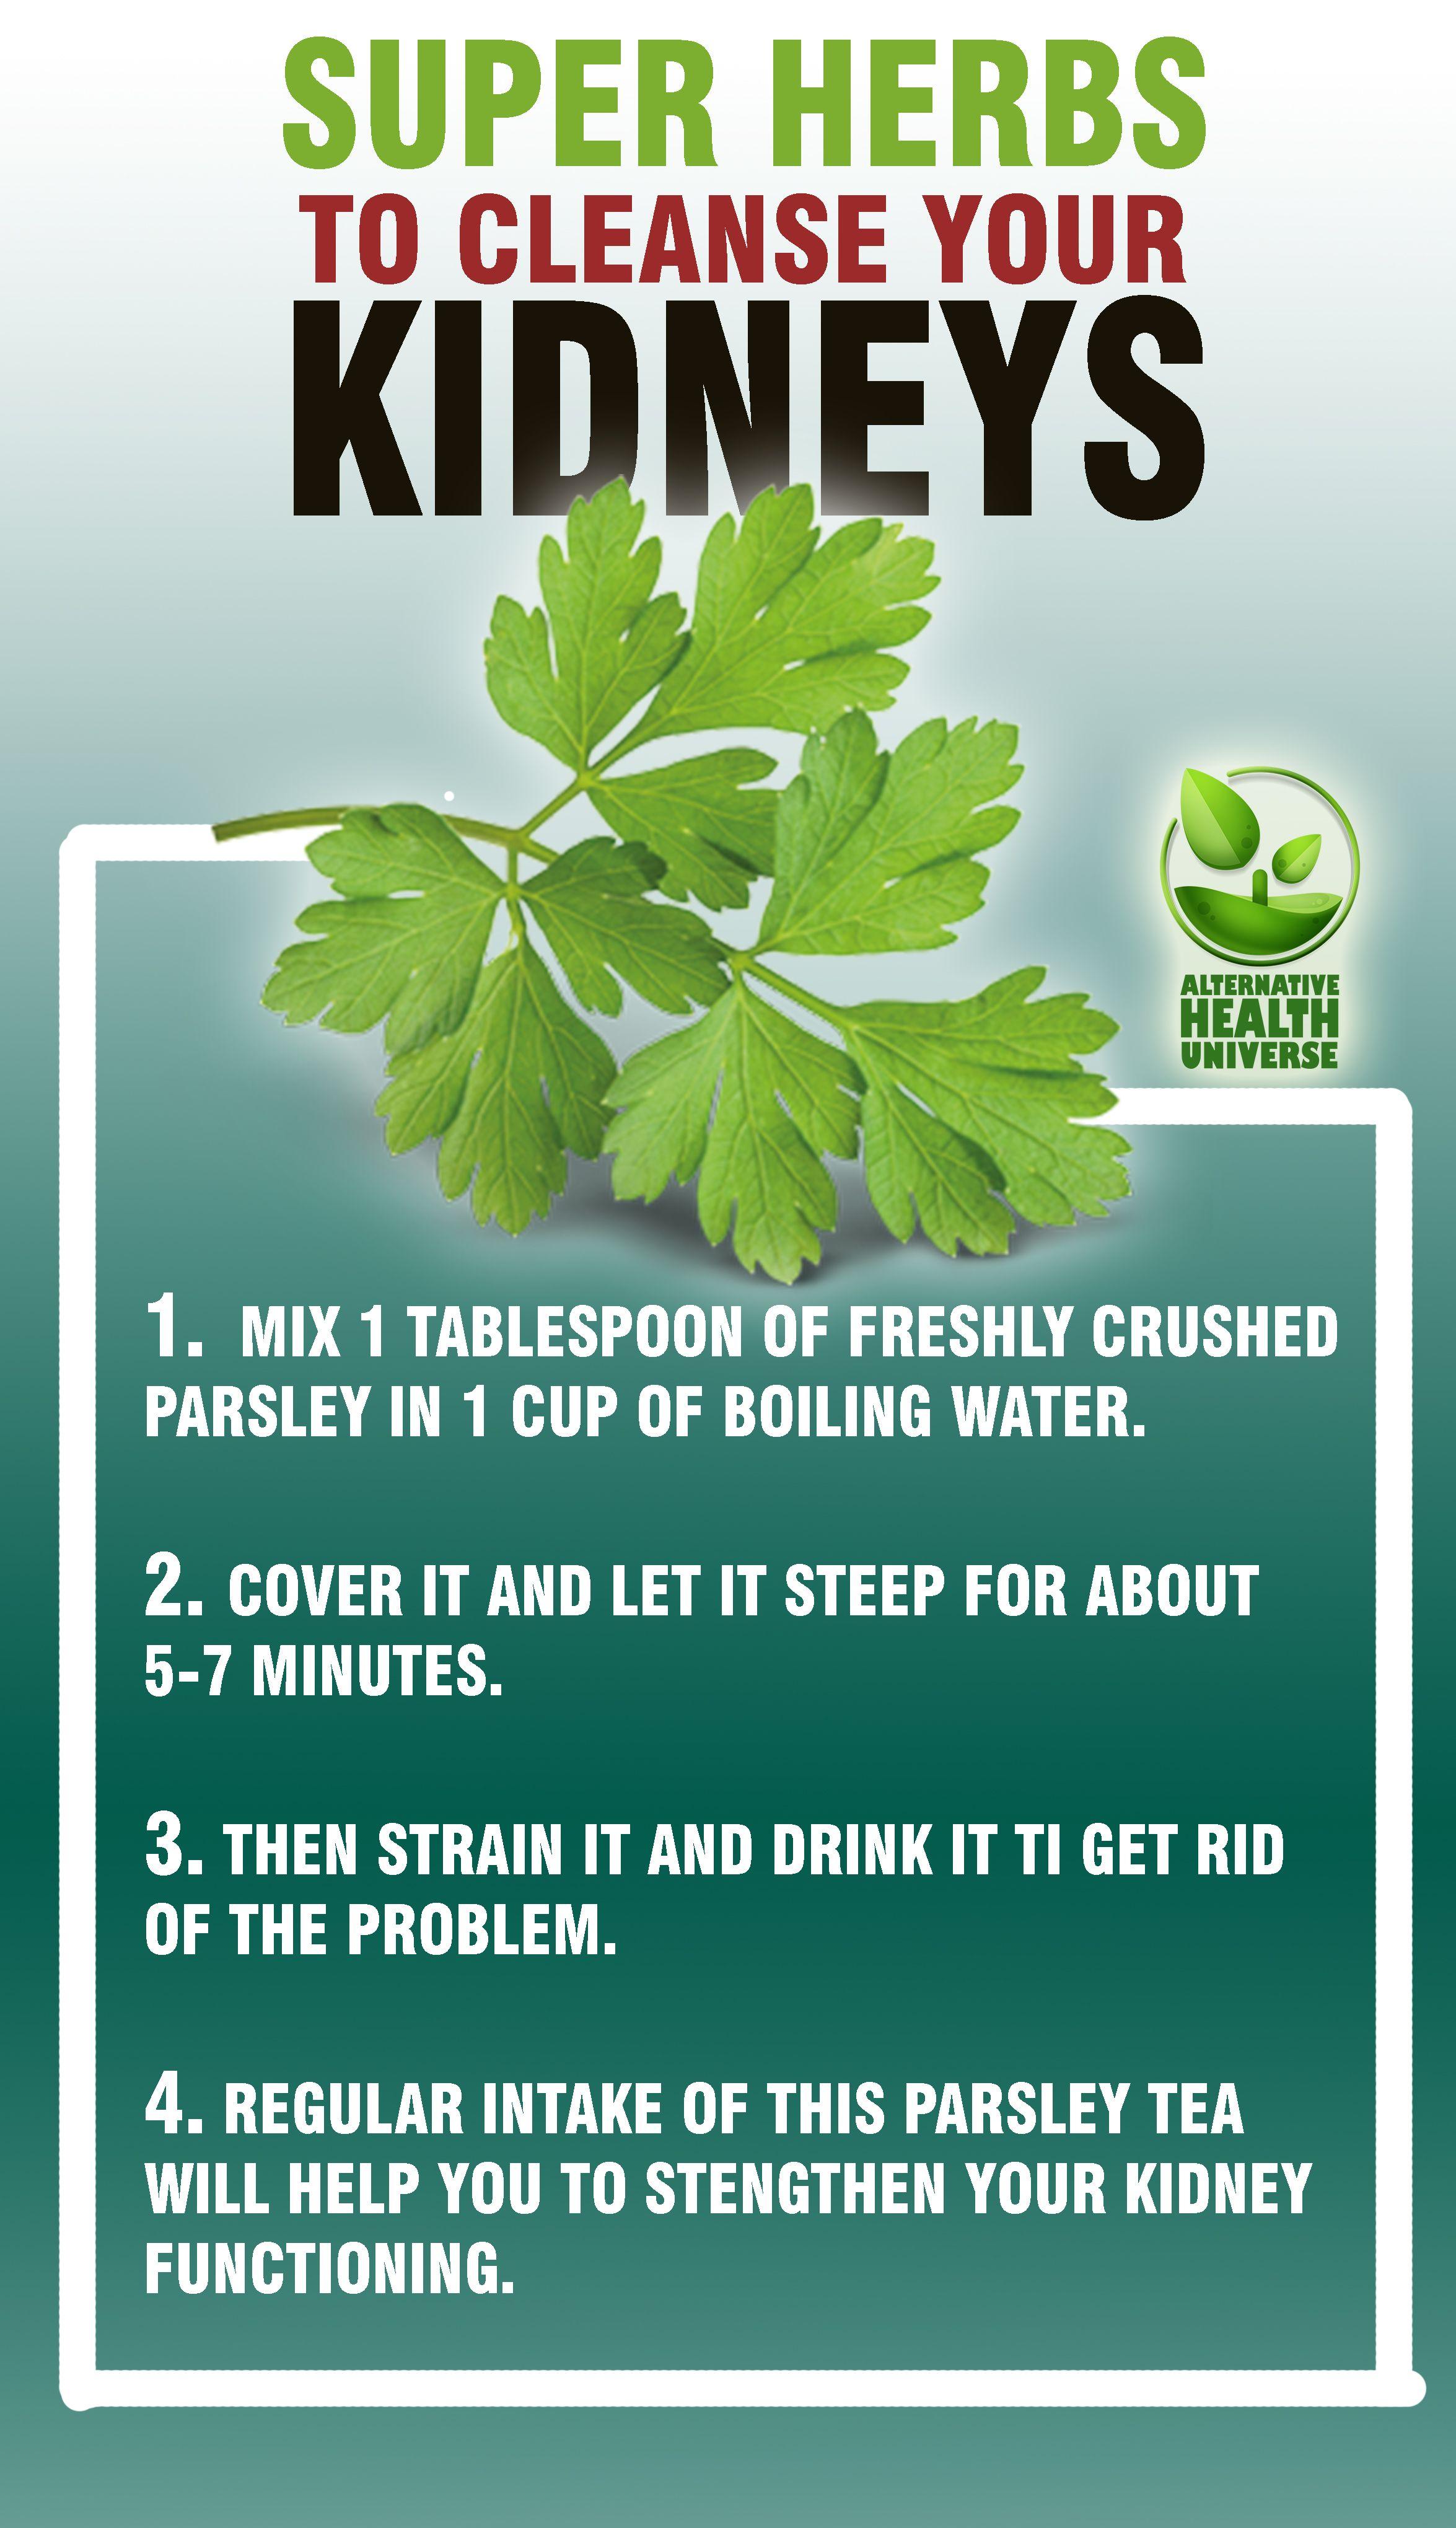 kidney detox herbs kidneys health cleanse super healthy natural drinks recipes friendly diet levels remedies juice creatinine foods cleansing food